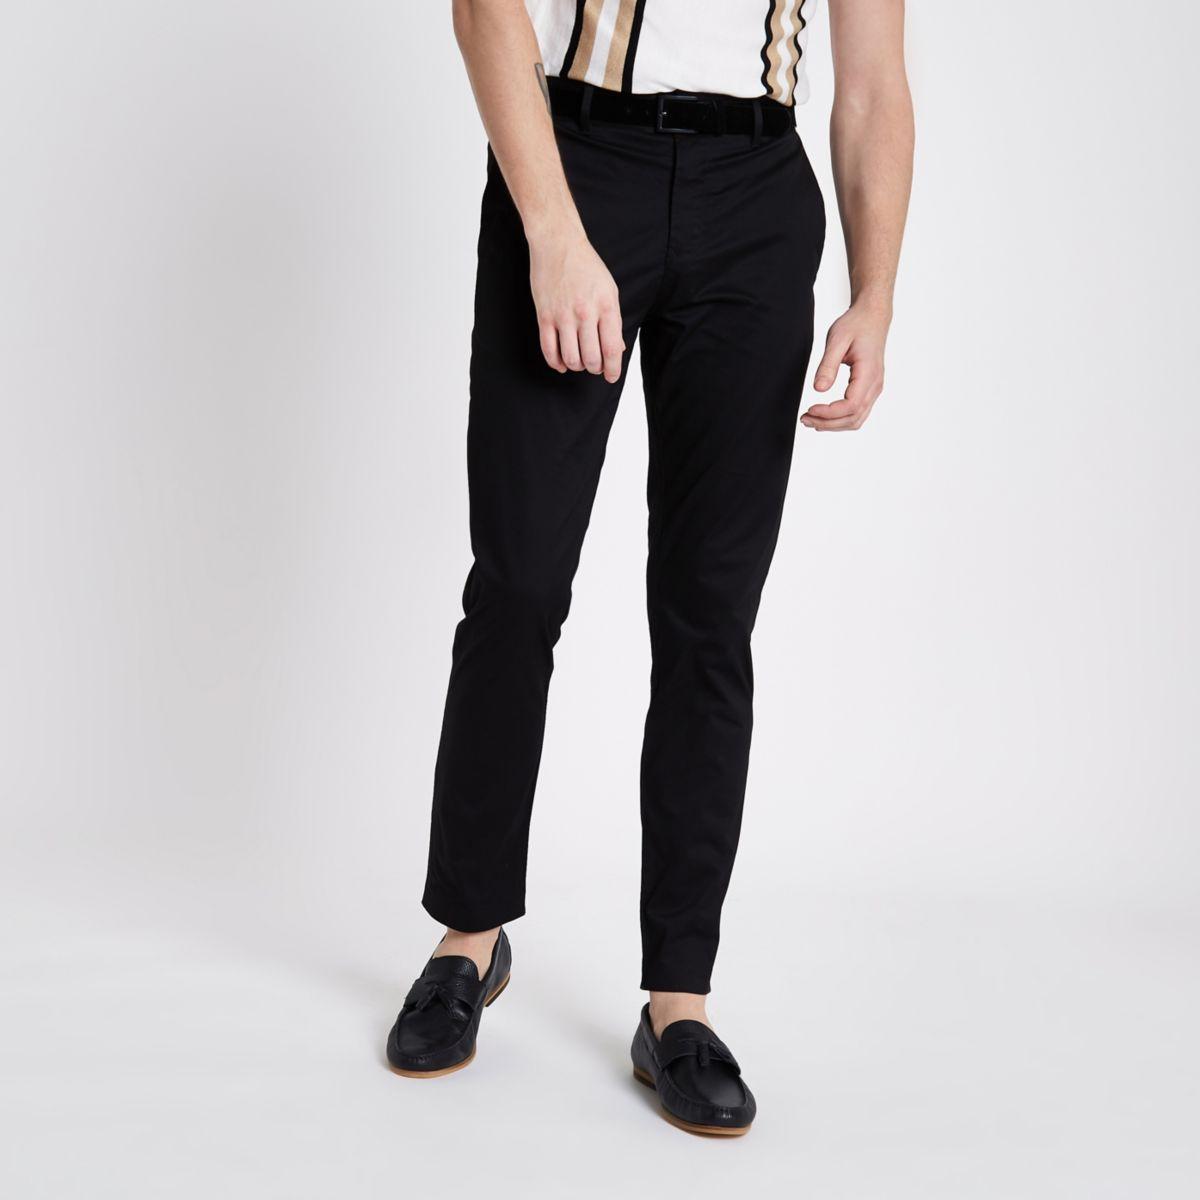 Schwarze Skinny Fit Chino-Hose mit Gürtel